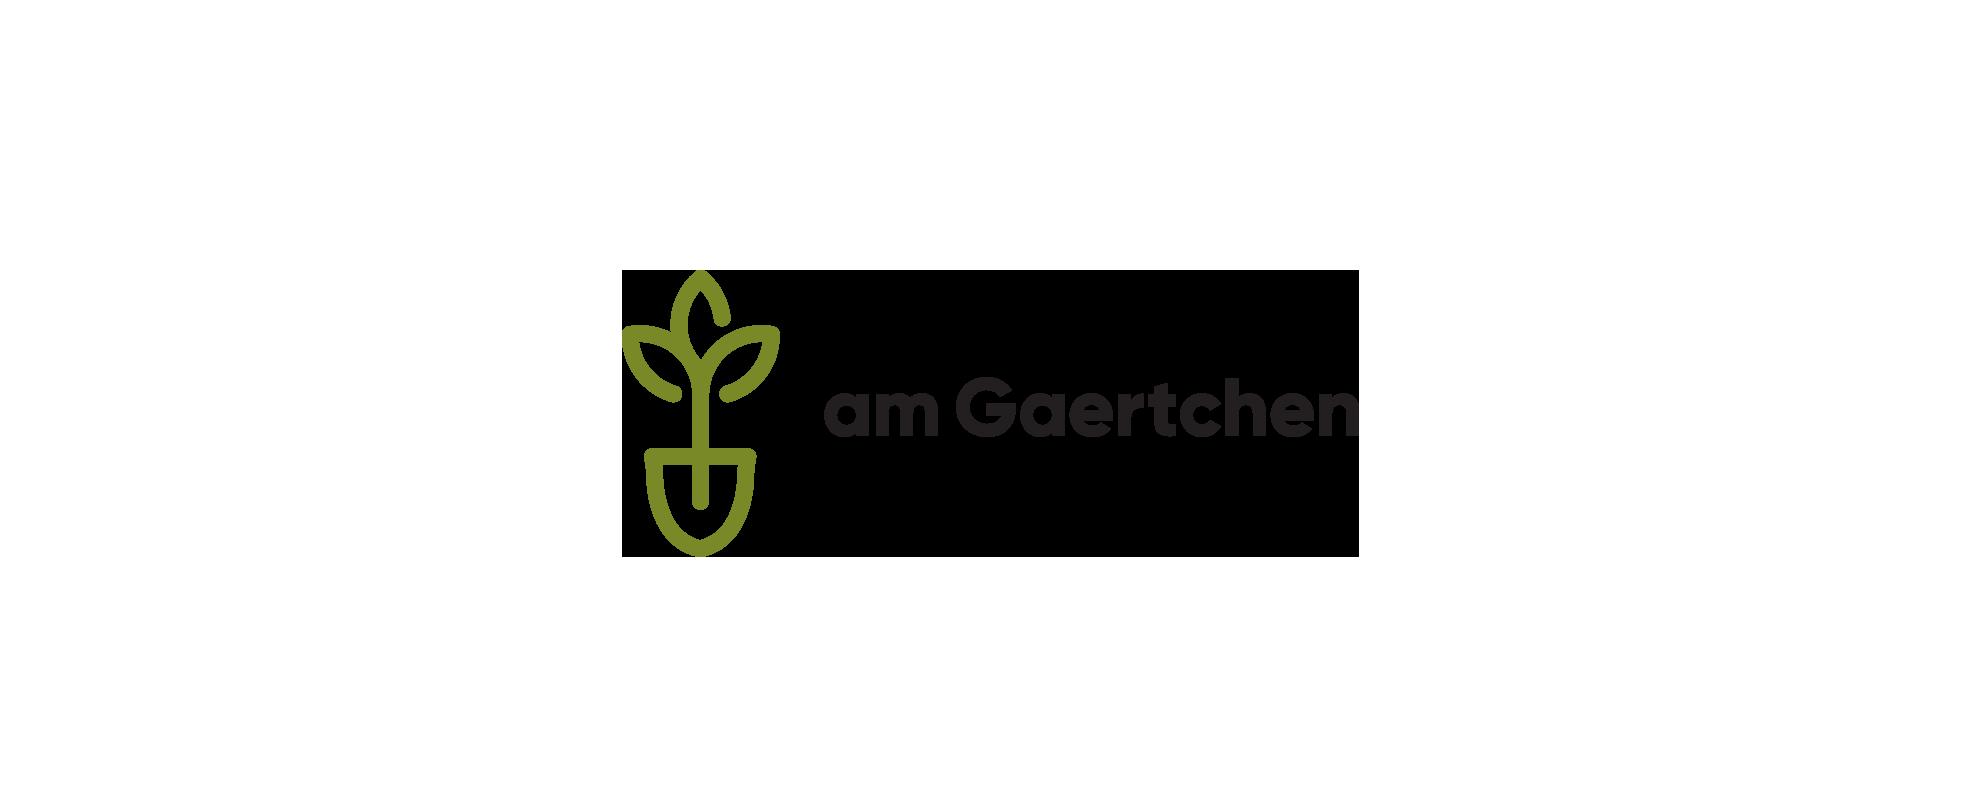 Am Gaertchen - packaging design, logo